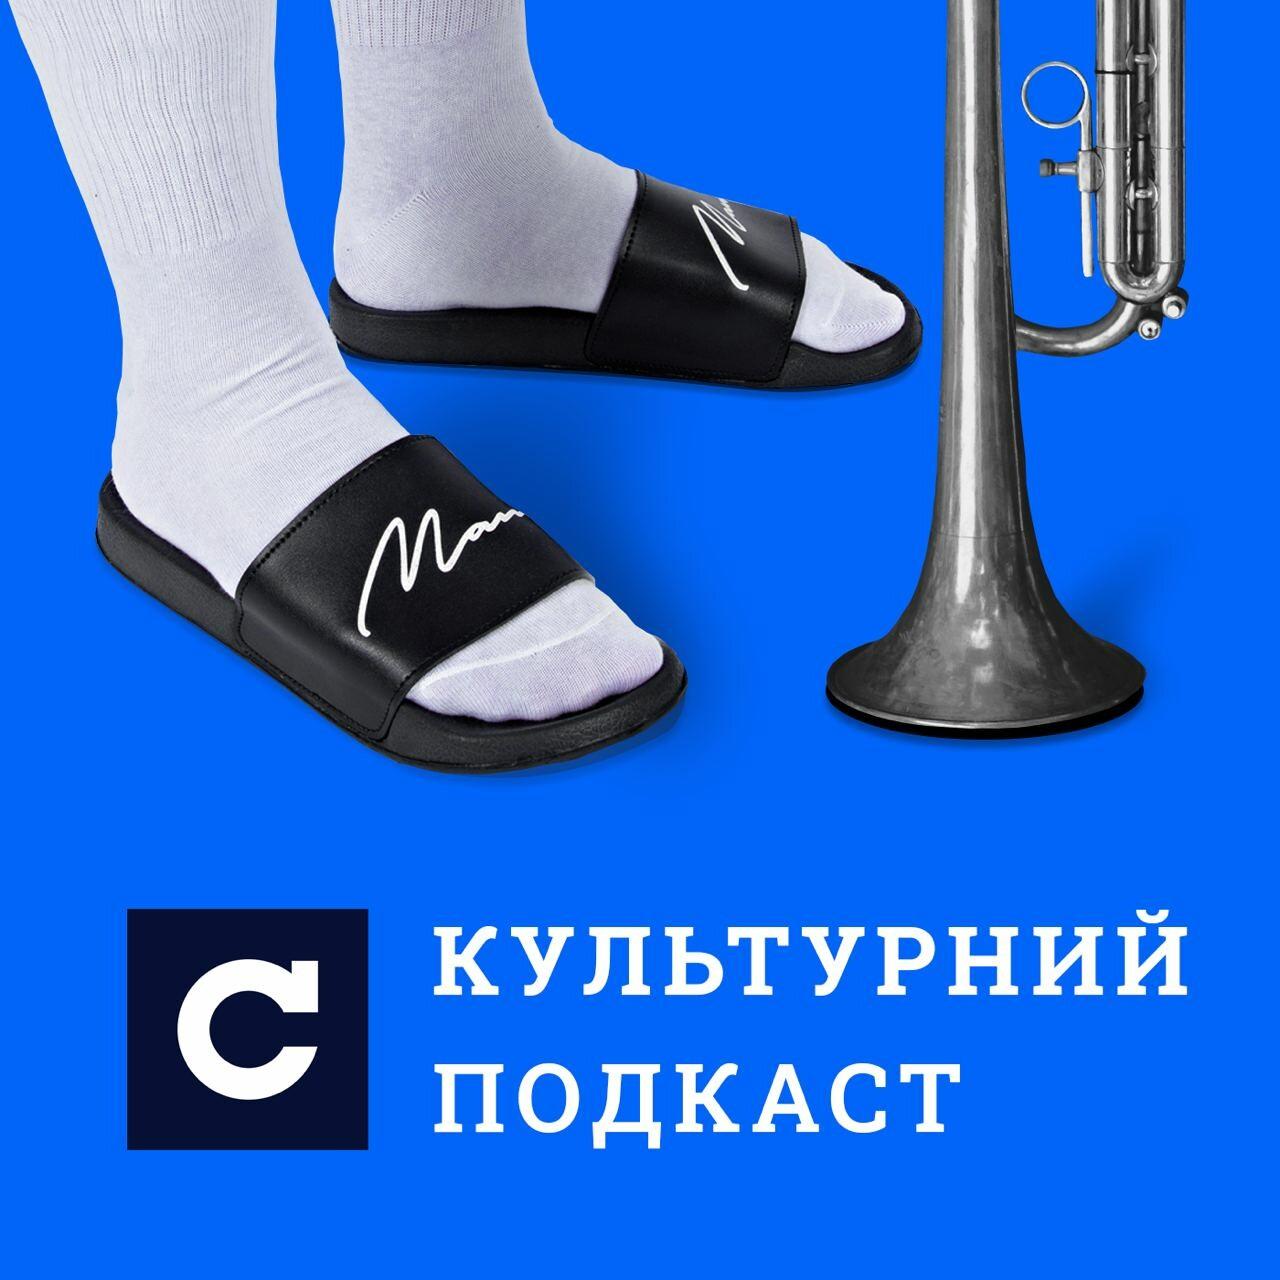 Музыка локдауна: чем живут музыканты во время карантина. В гостях Александр Рябко.